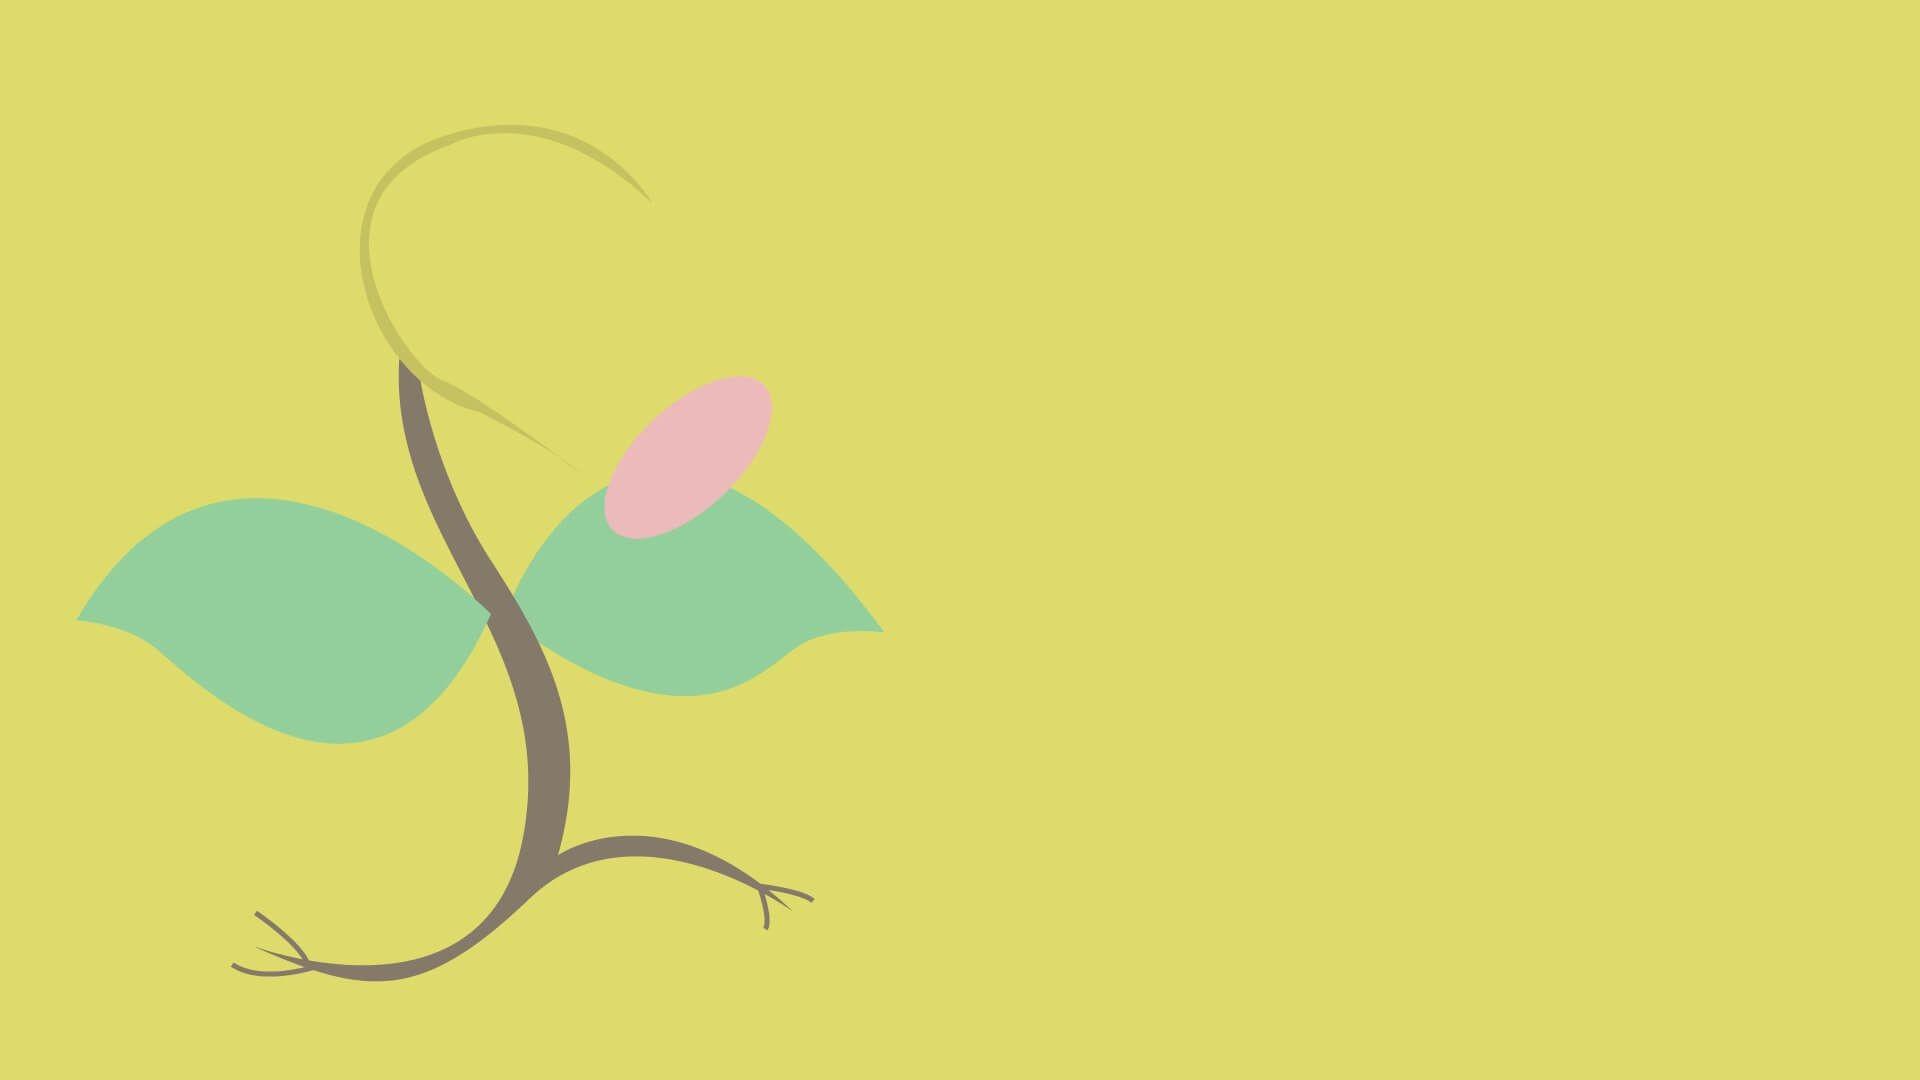 Minimalist Pokemon Wallpaper Hd